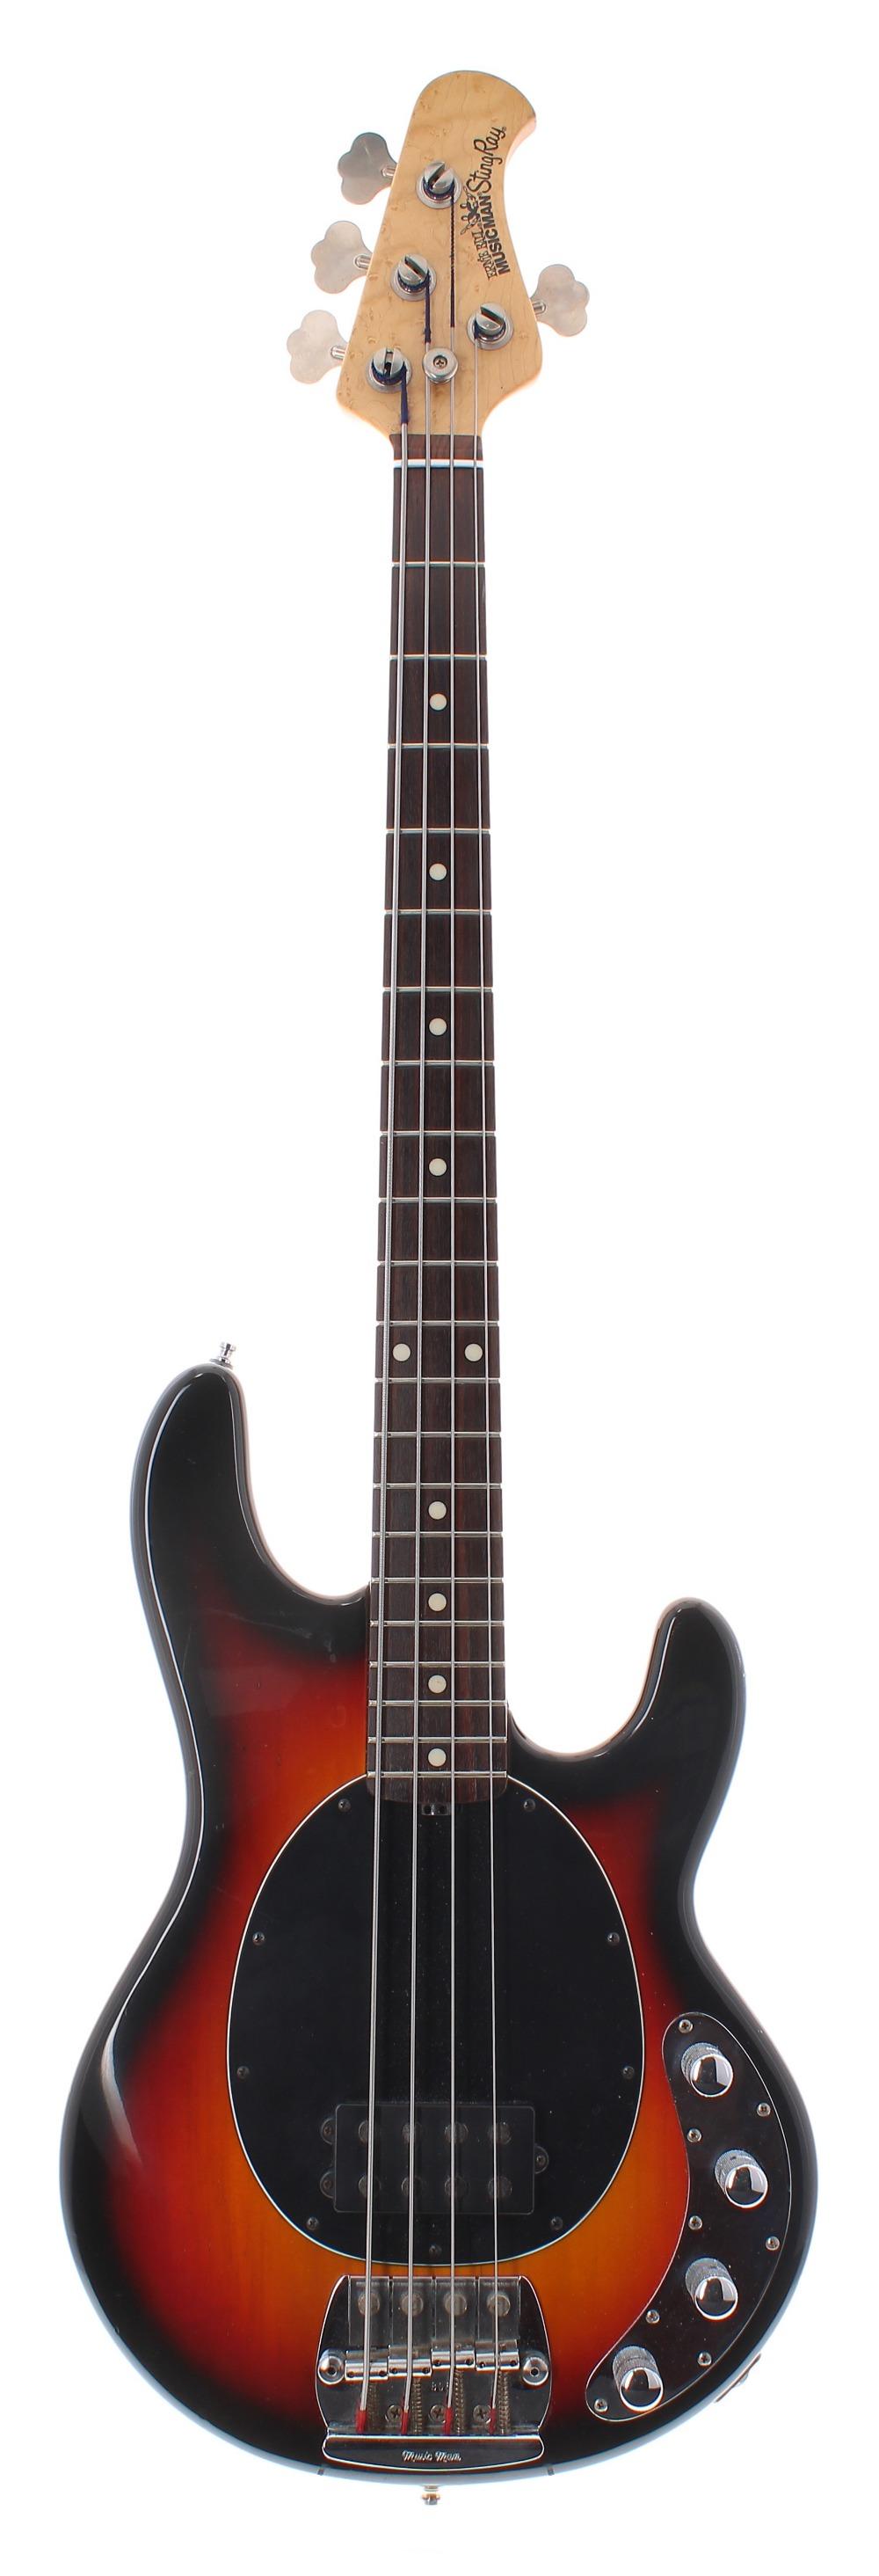 Early 1990s Ernie Ball Music Man Stingray bass guitar, made in USA, ser. no. 8xxx6; Finish: